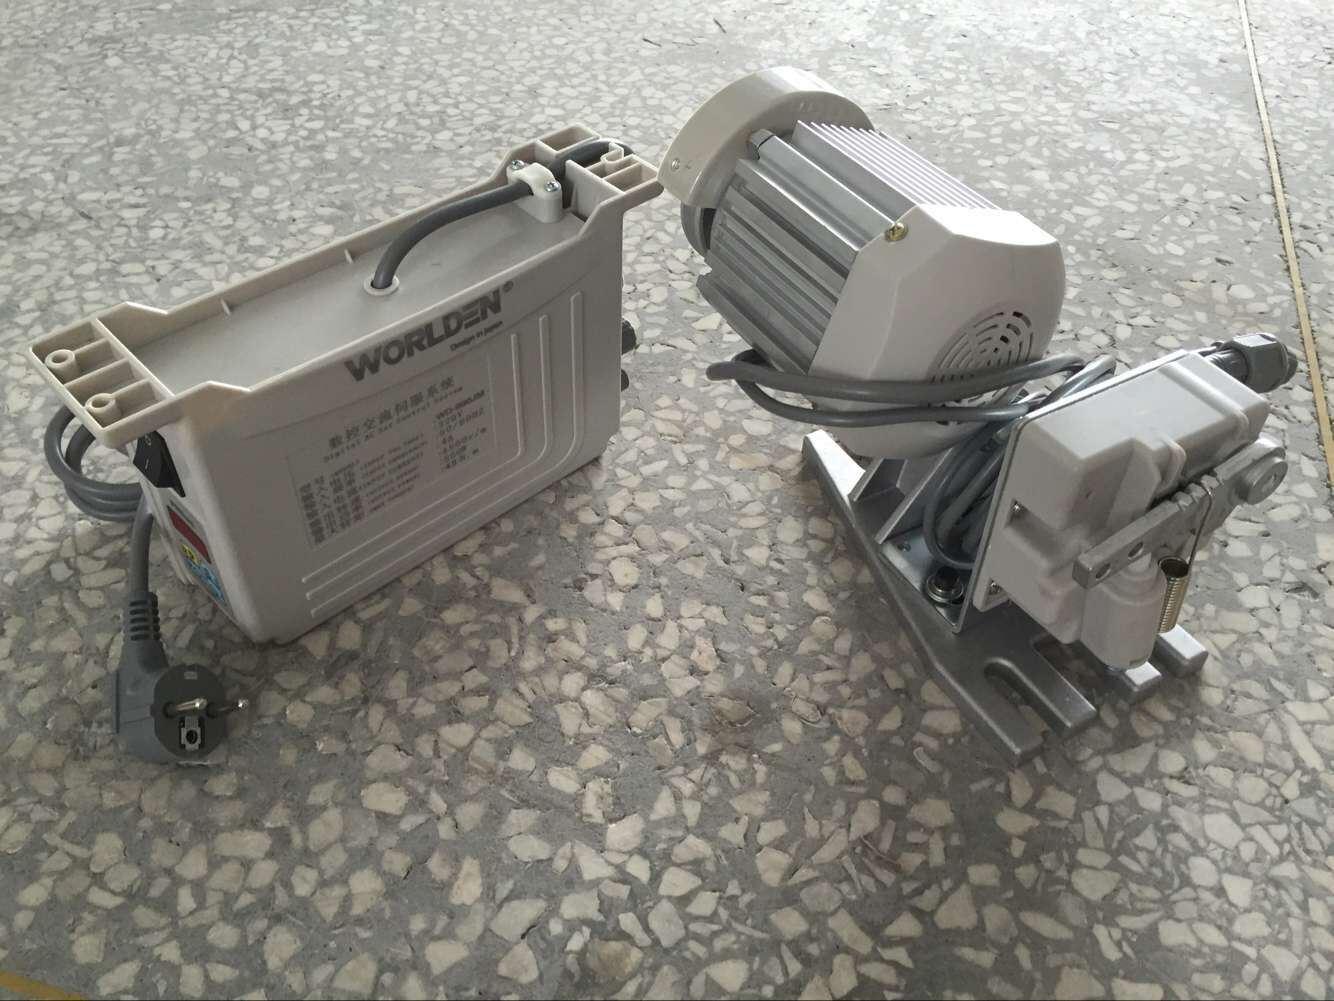 Wd-990jm Split Type Energy Saving Motor for Industrial Sewing Machine